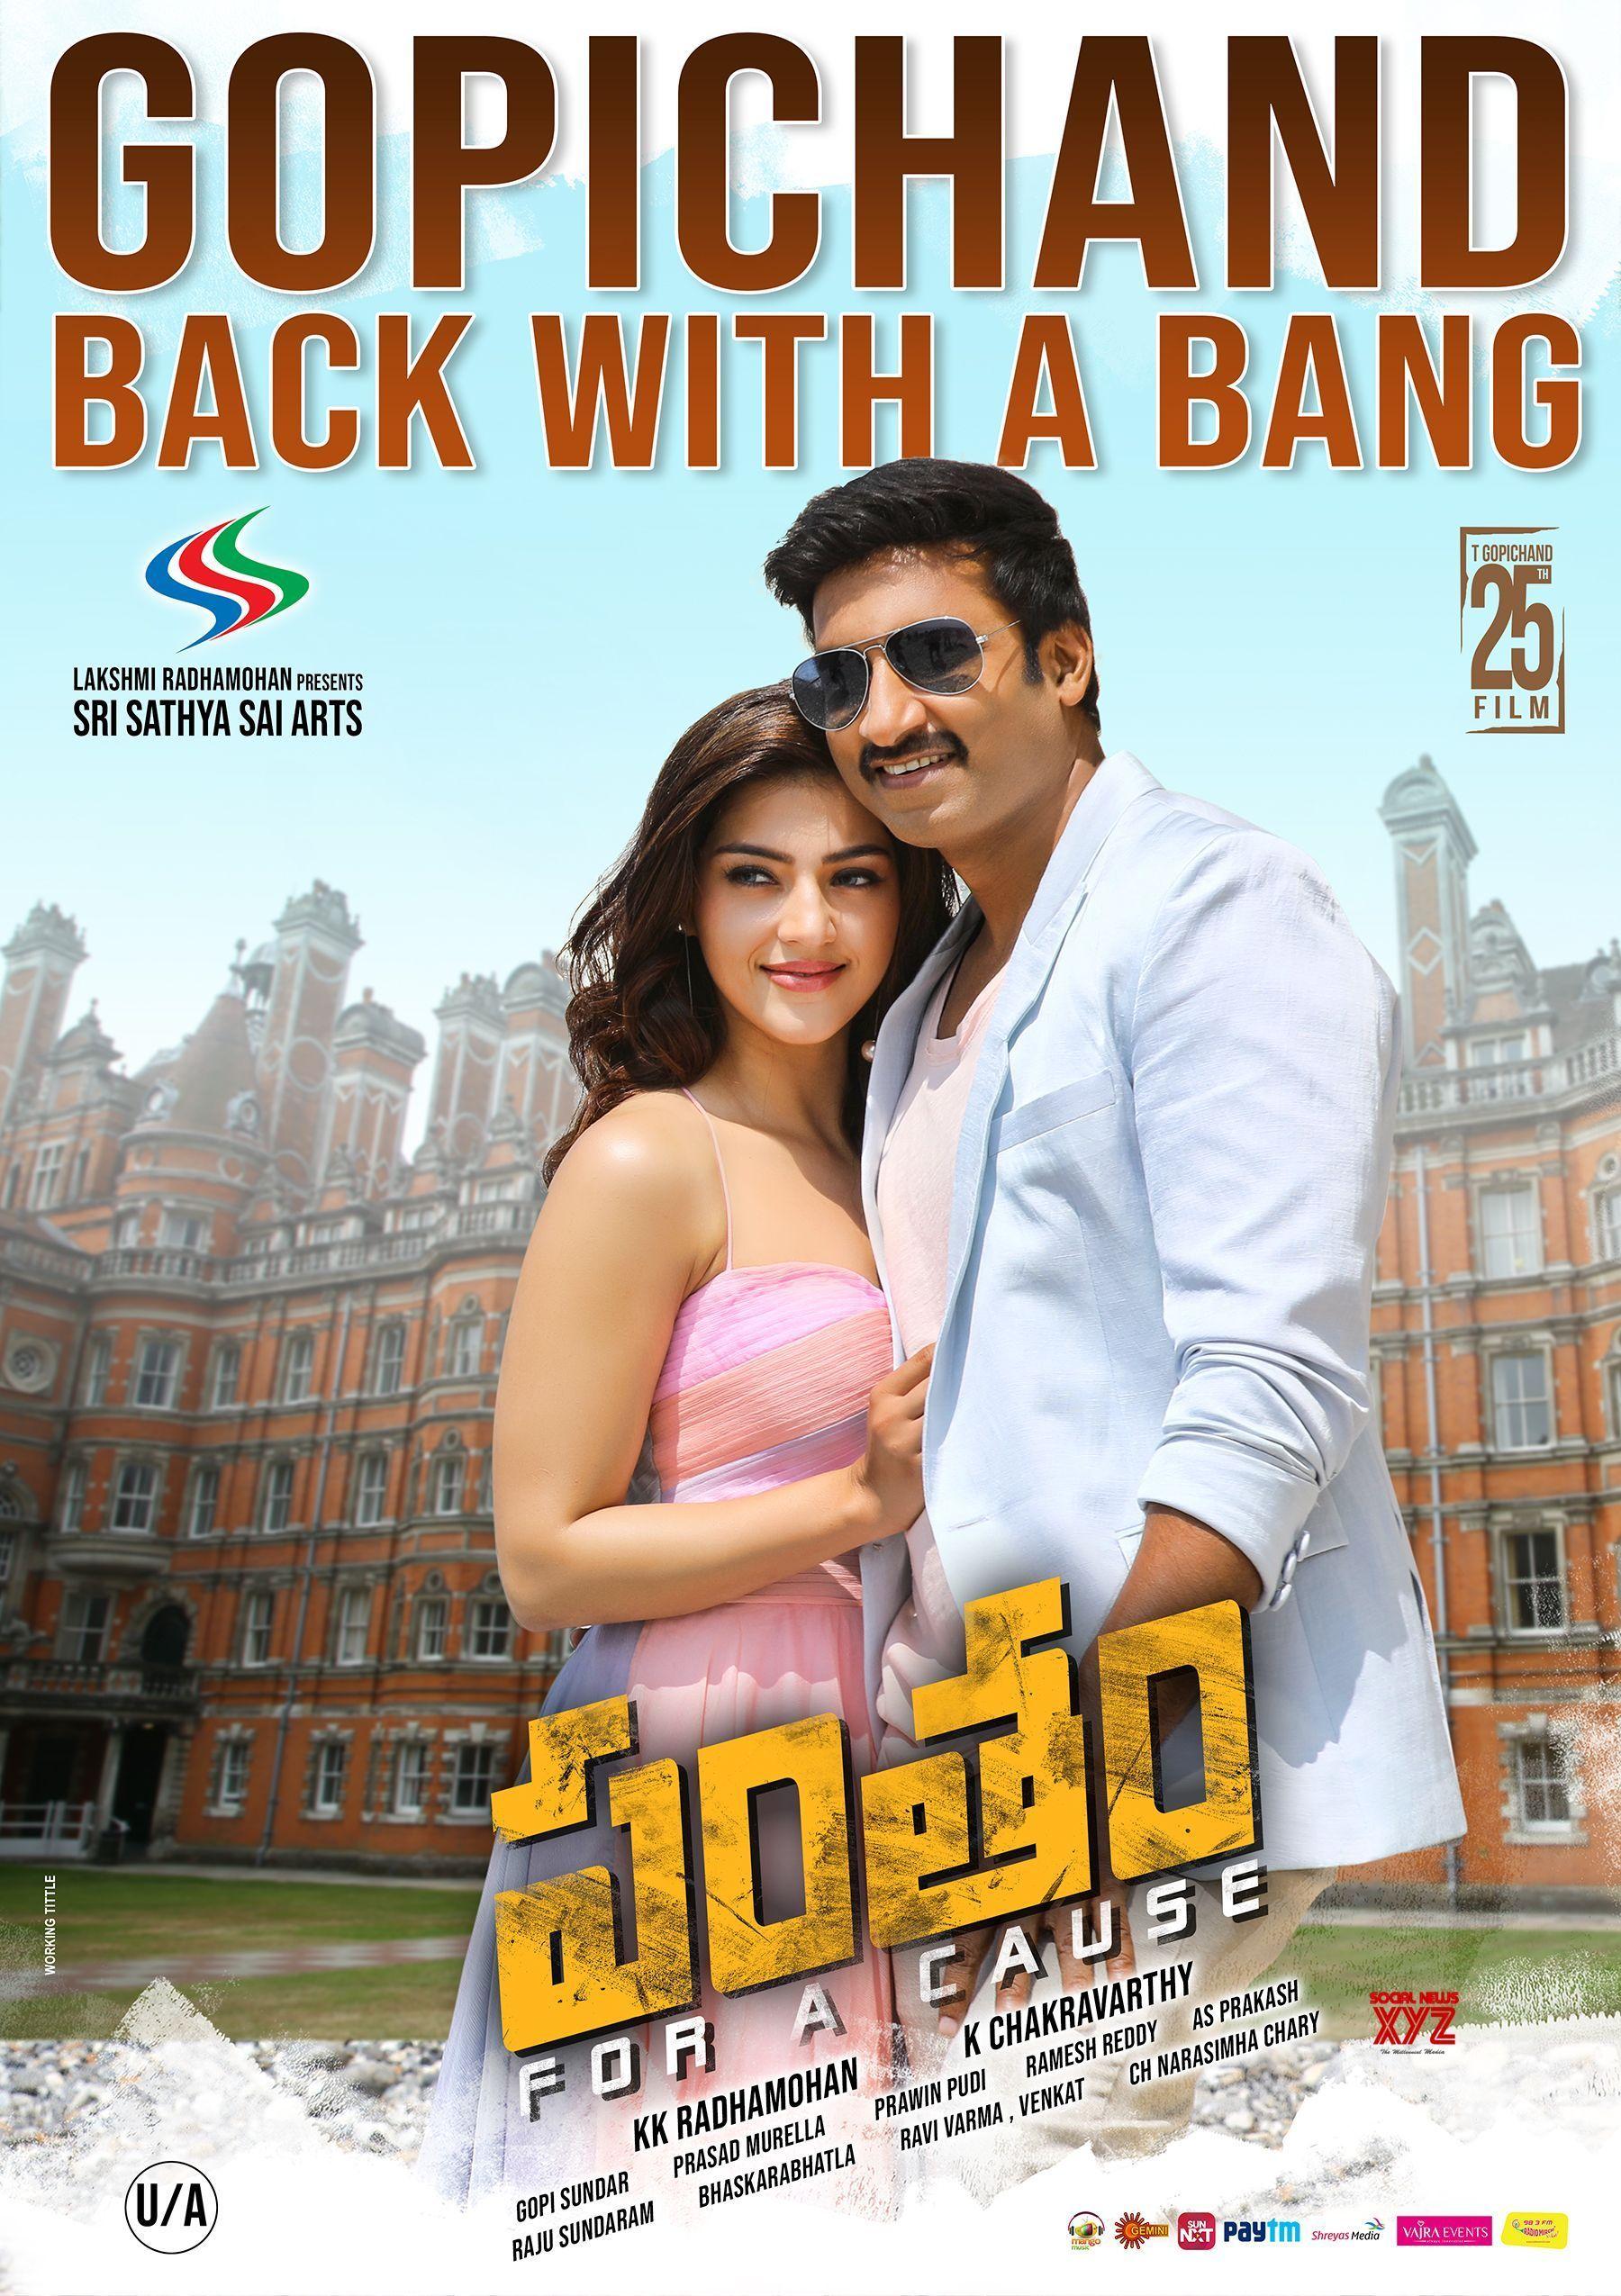 Pantham Movie New Hd Posters Social News Xyz Telugu Movies Box Office Collection Telugu